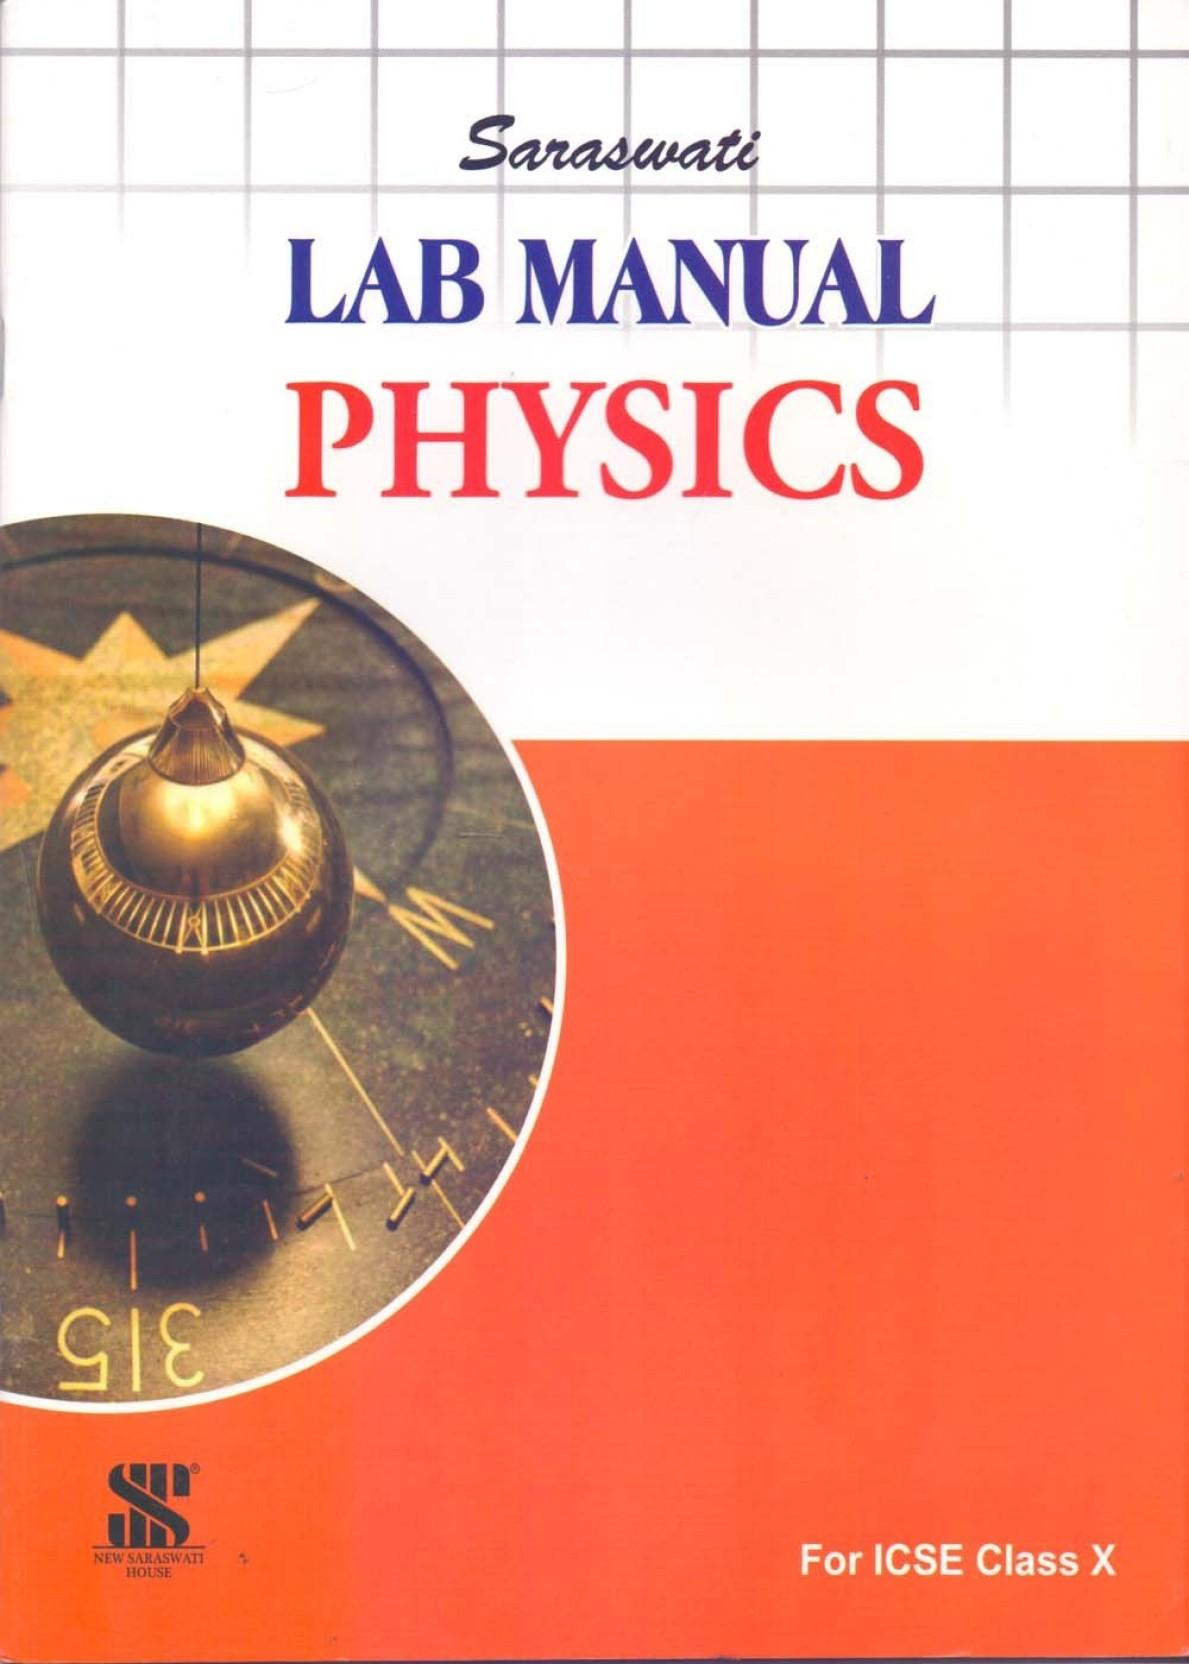 Saraswati Physics Lab Manual Class - 10. Share